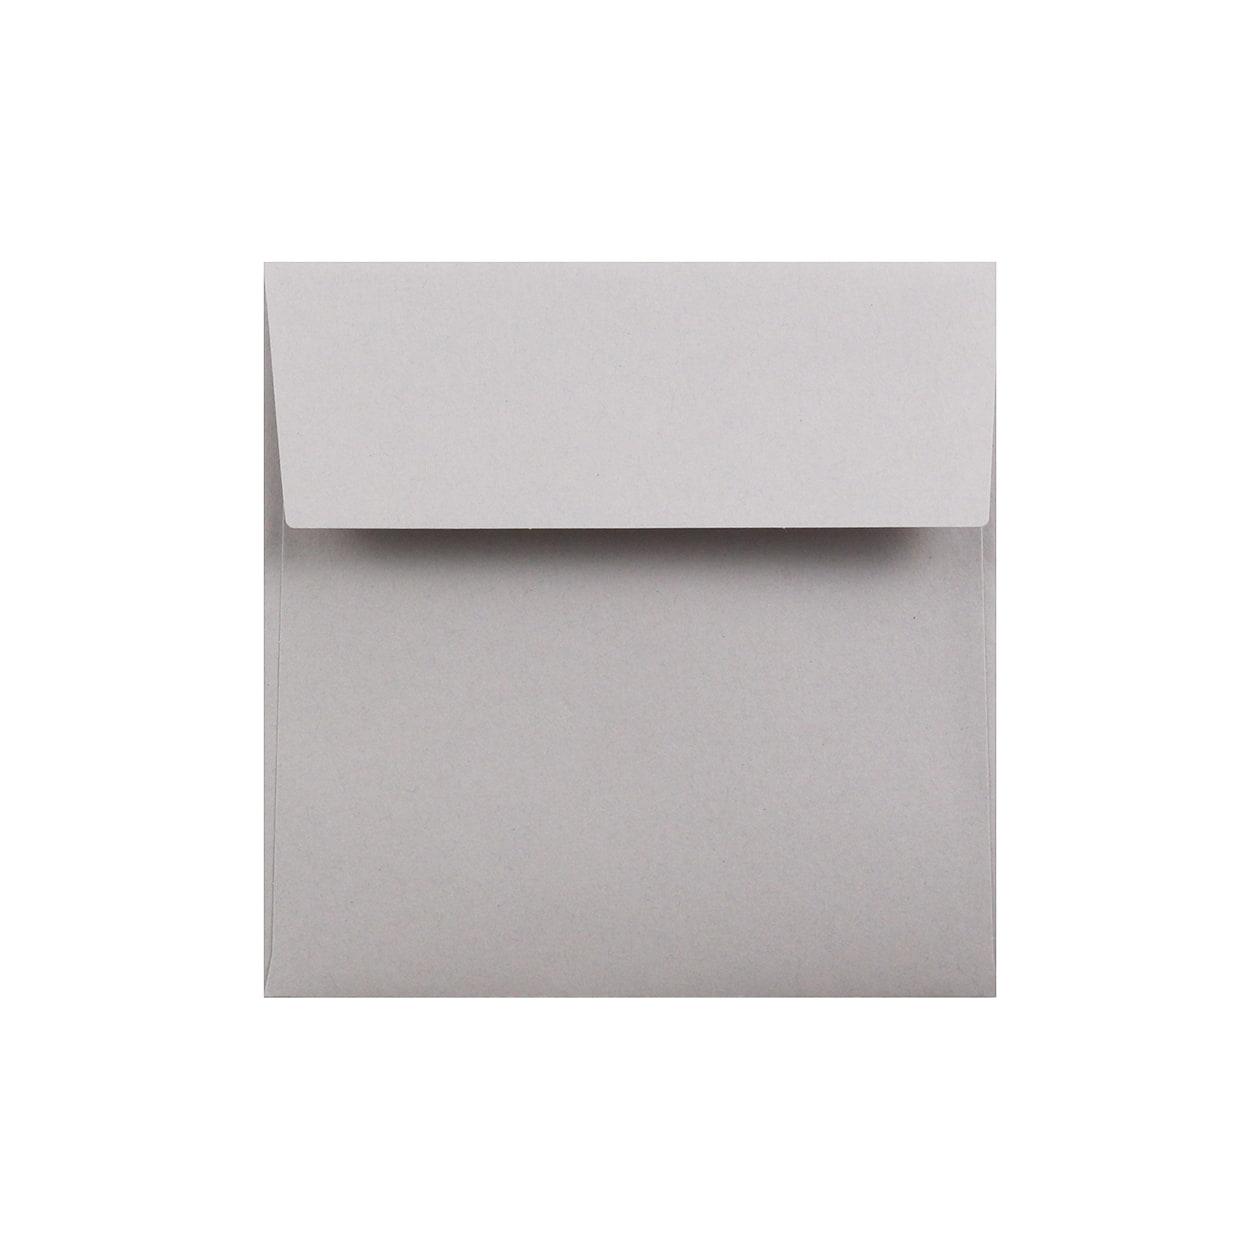 SE16カマス封筒 HAGURUMA Basic ライナーグレイ 100g